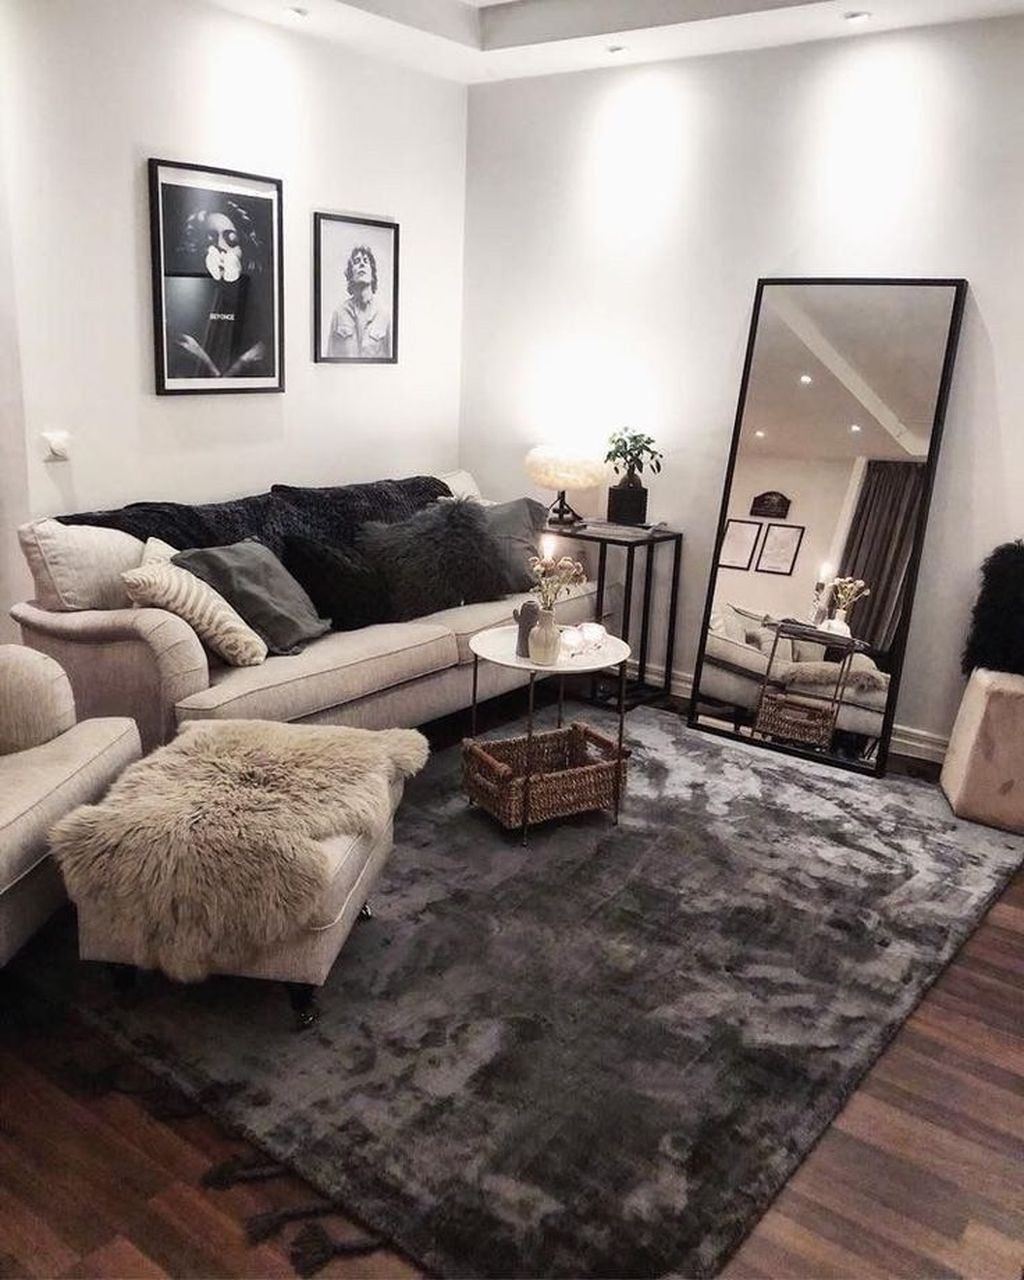 Inspiring Small Living Room Decor Ideas 17